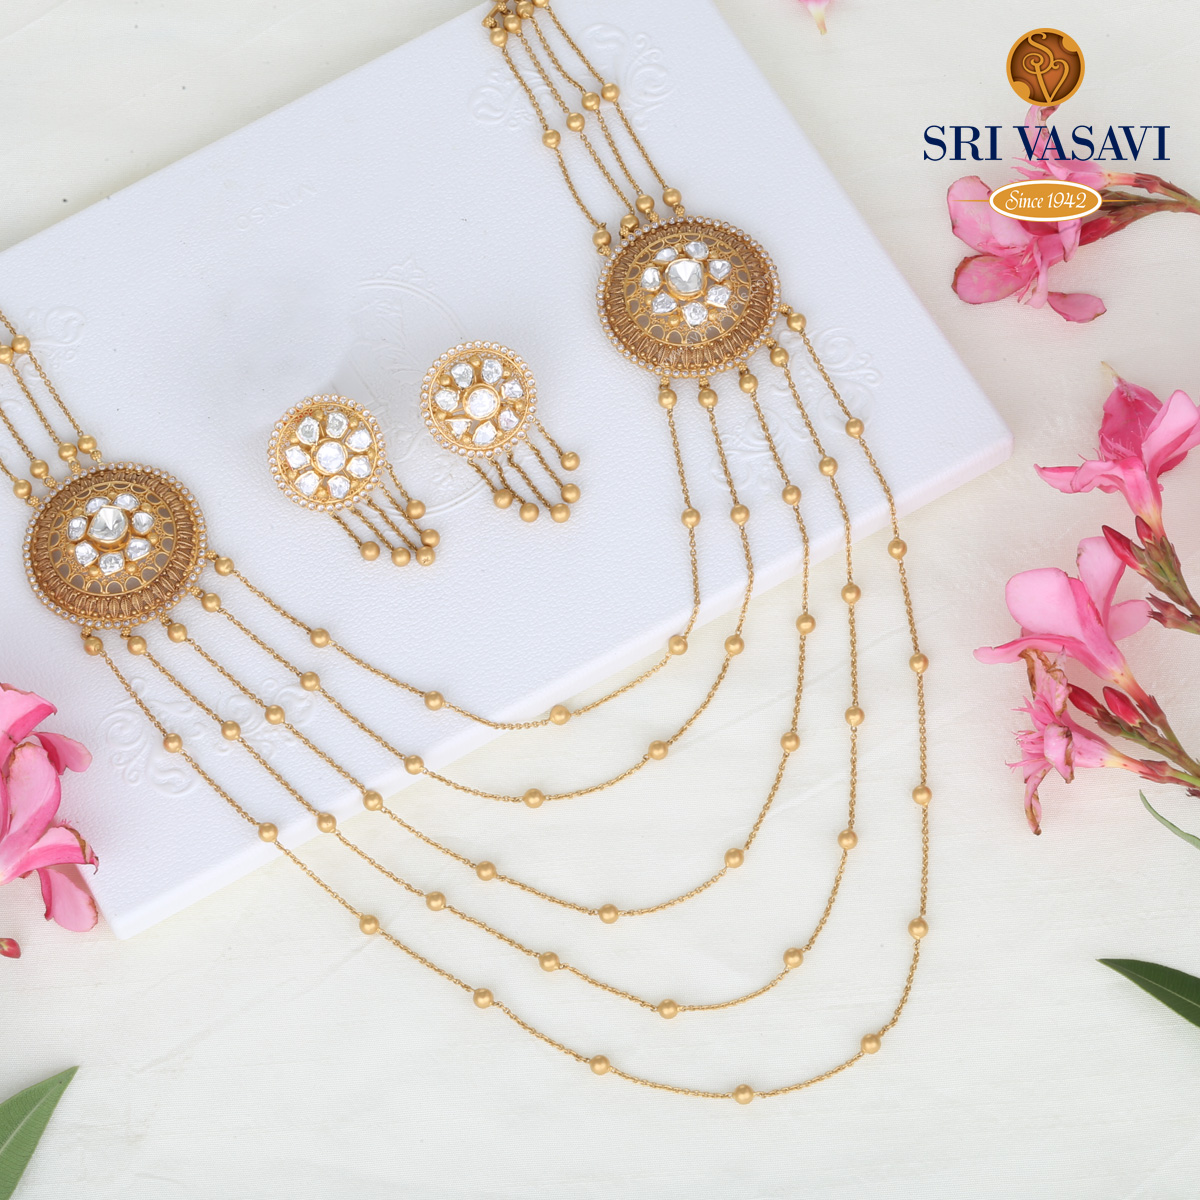 Regalia Layered Necklace Set